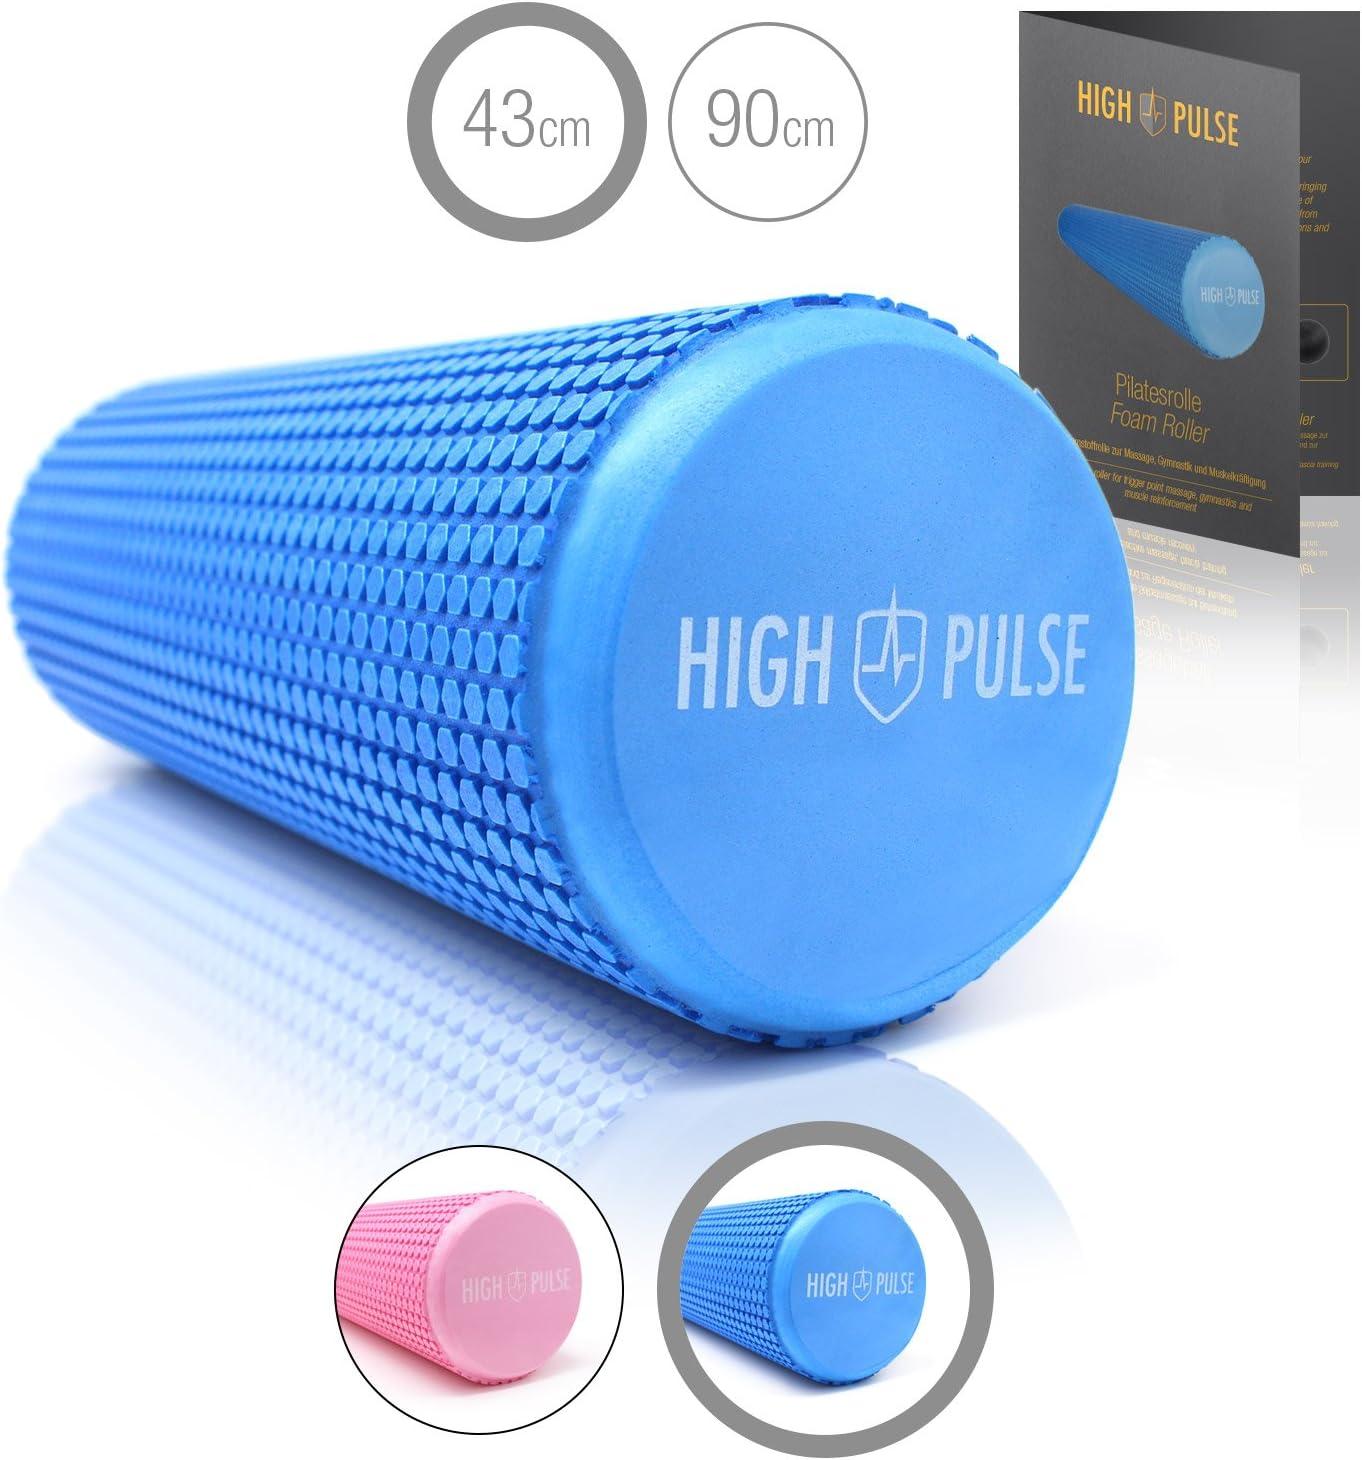 Schaumstoffrolle 90 x 15 cm Übungsposter High Pulse Pilatesrolle inkl